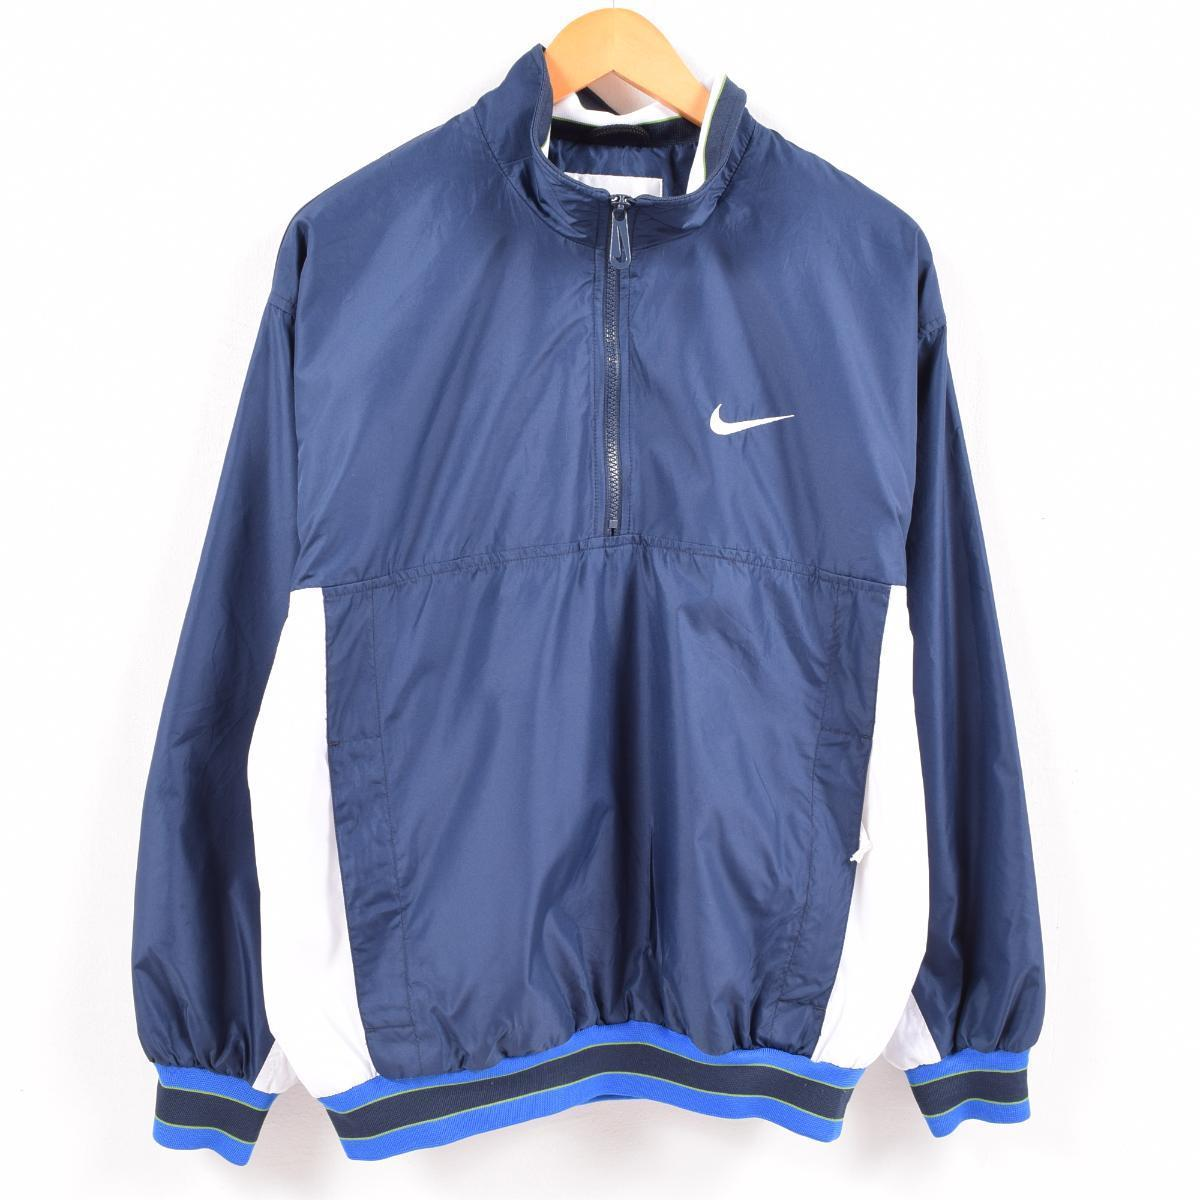 latest fashion hot product buying cheap 90s Nike NIKE half zip windbreaker men M /waw6206